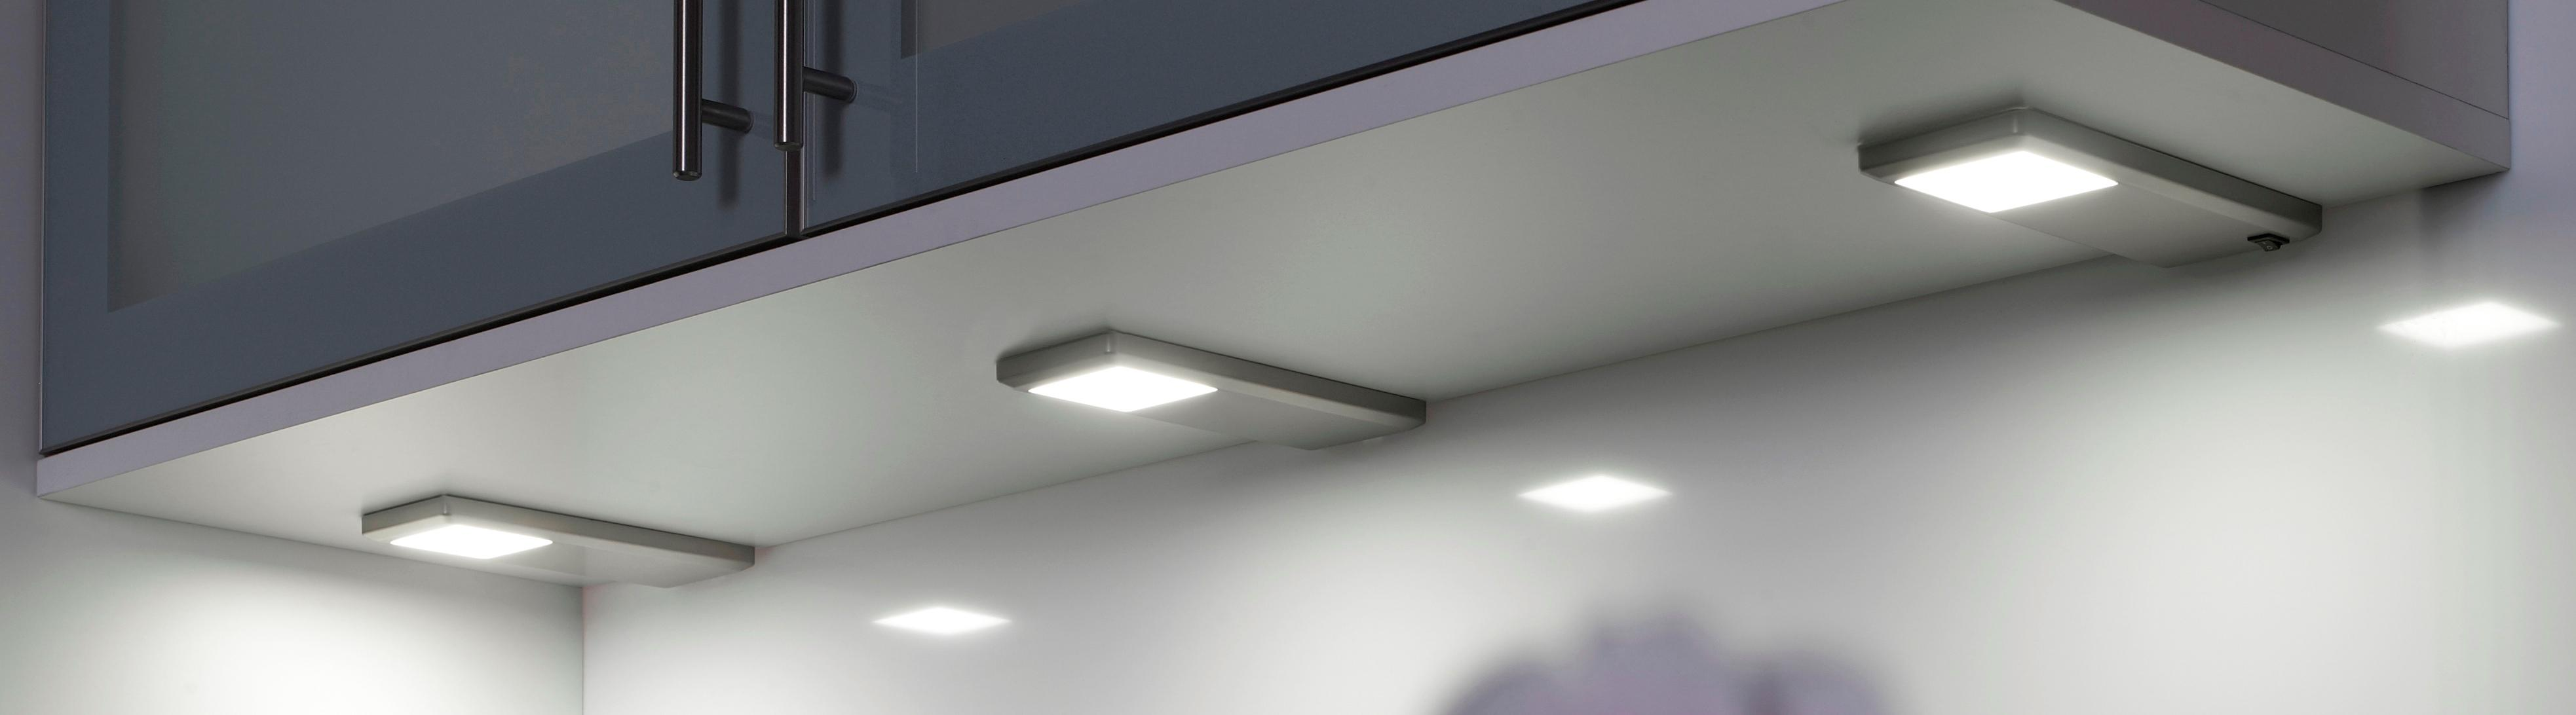 LED Unterbauleuchten - Vogt Online-Shop